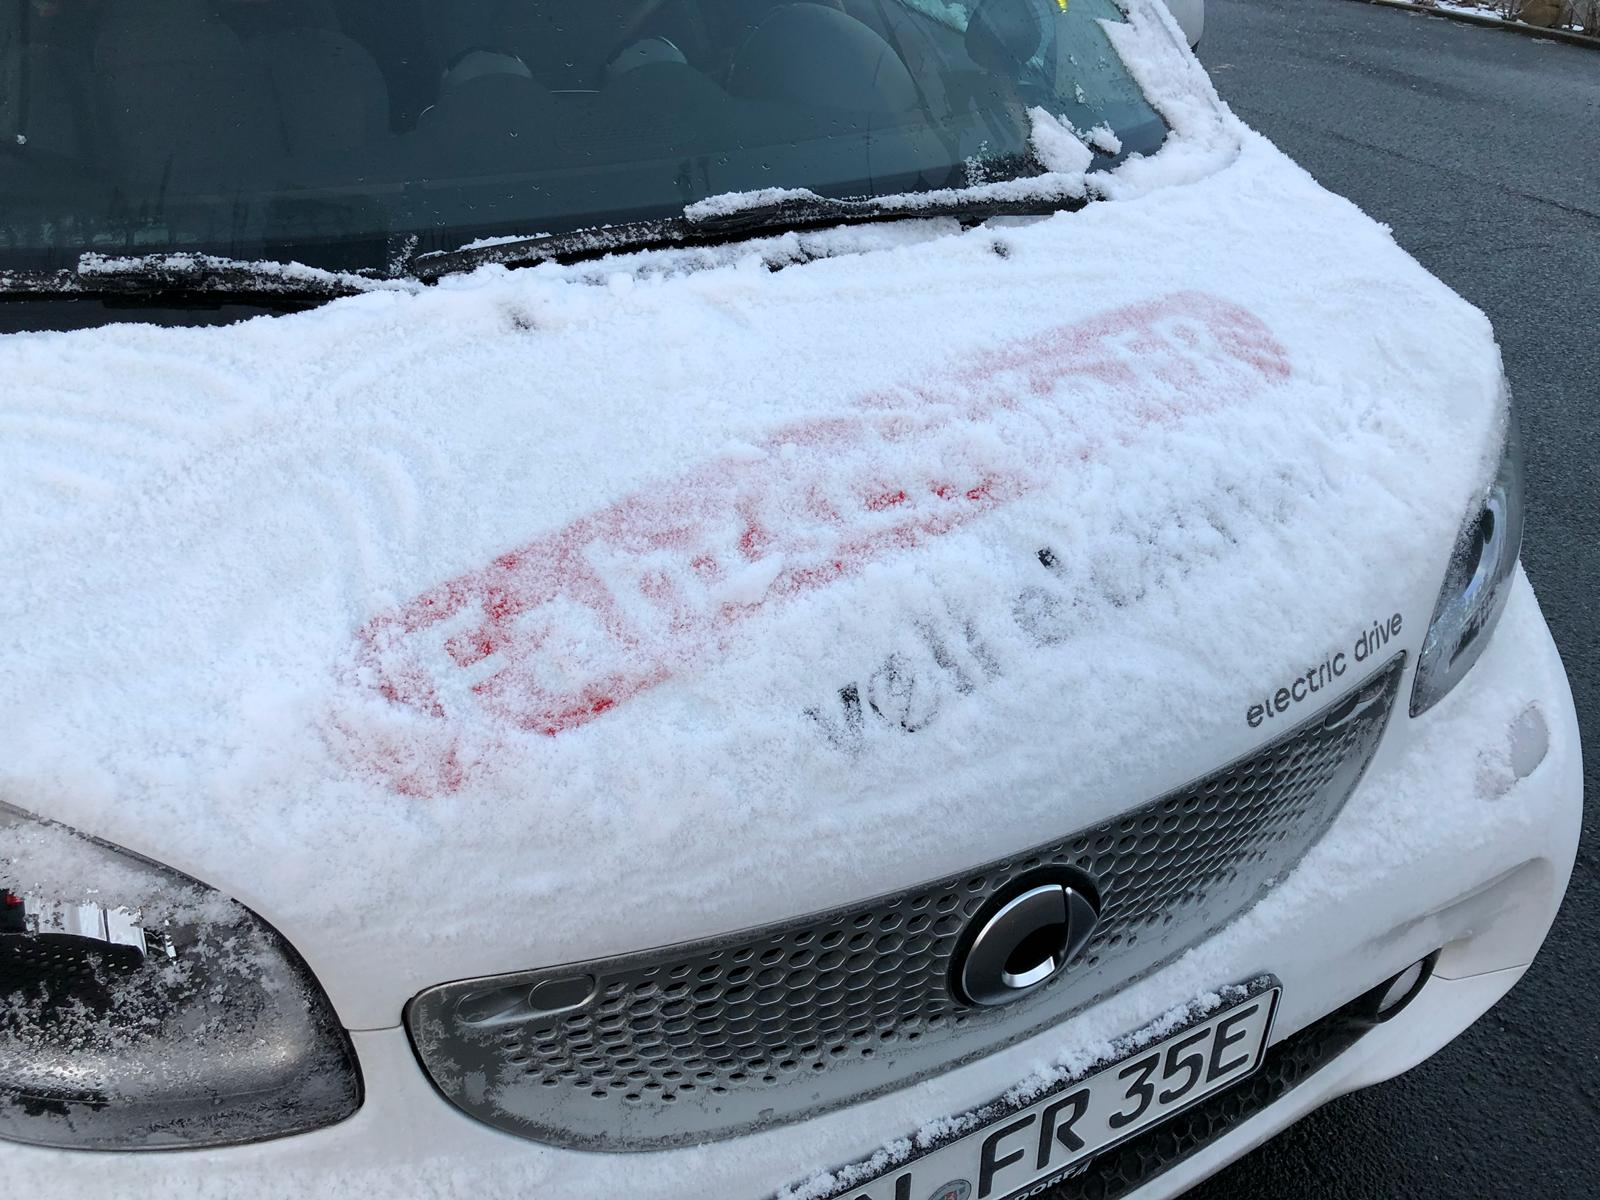 Fahrzeug Winter-Check! Was tun…?